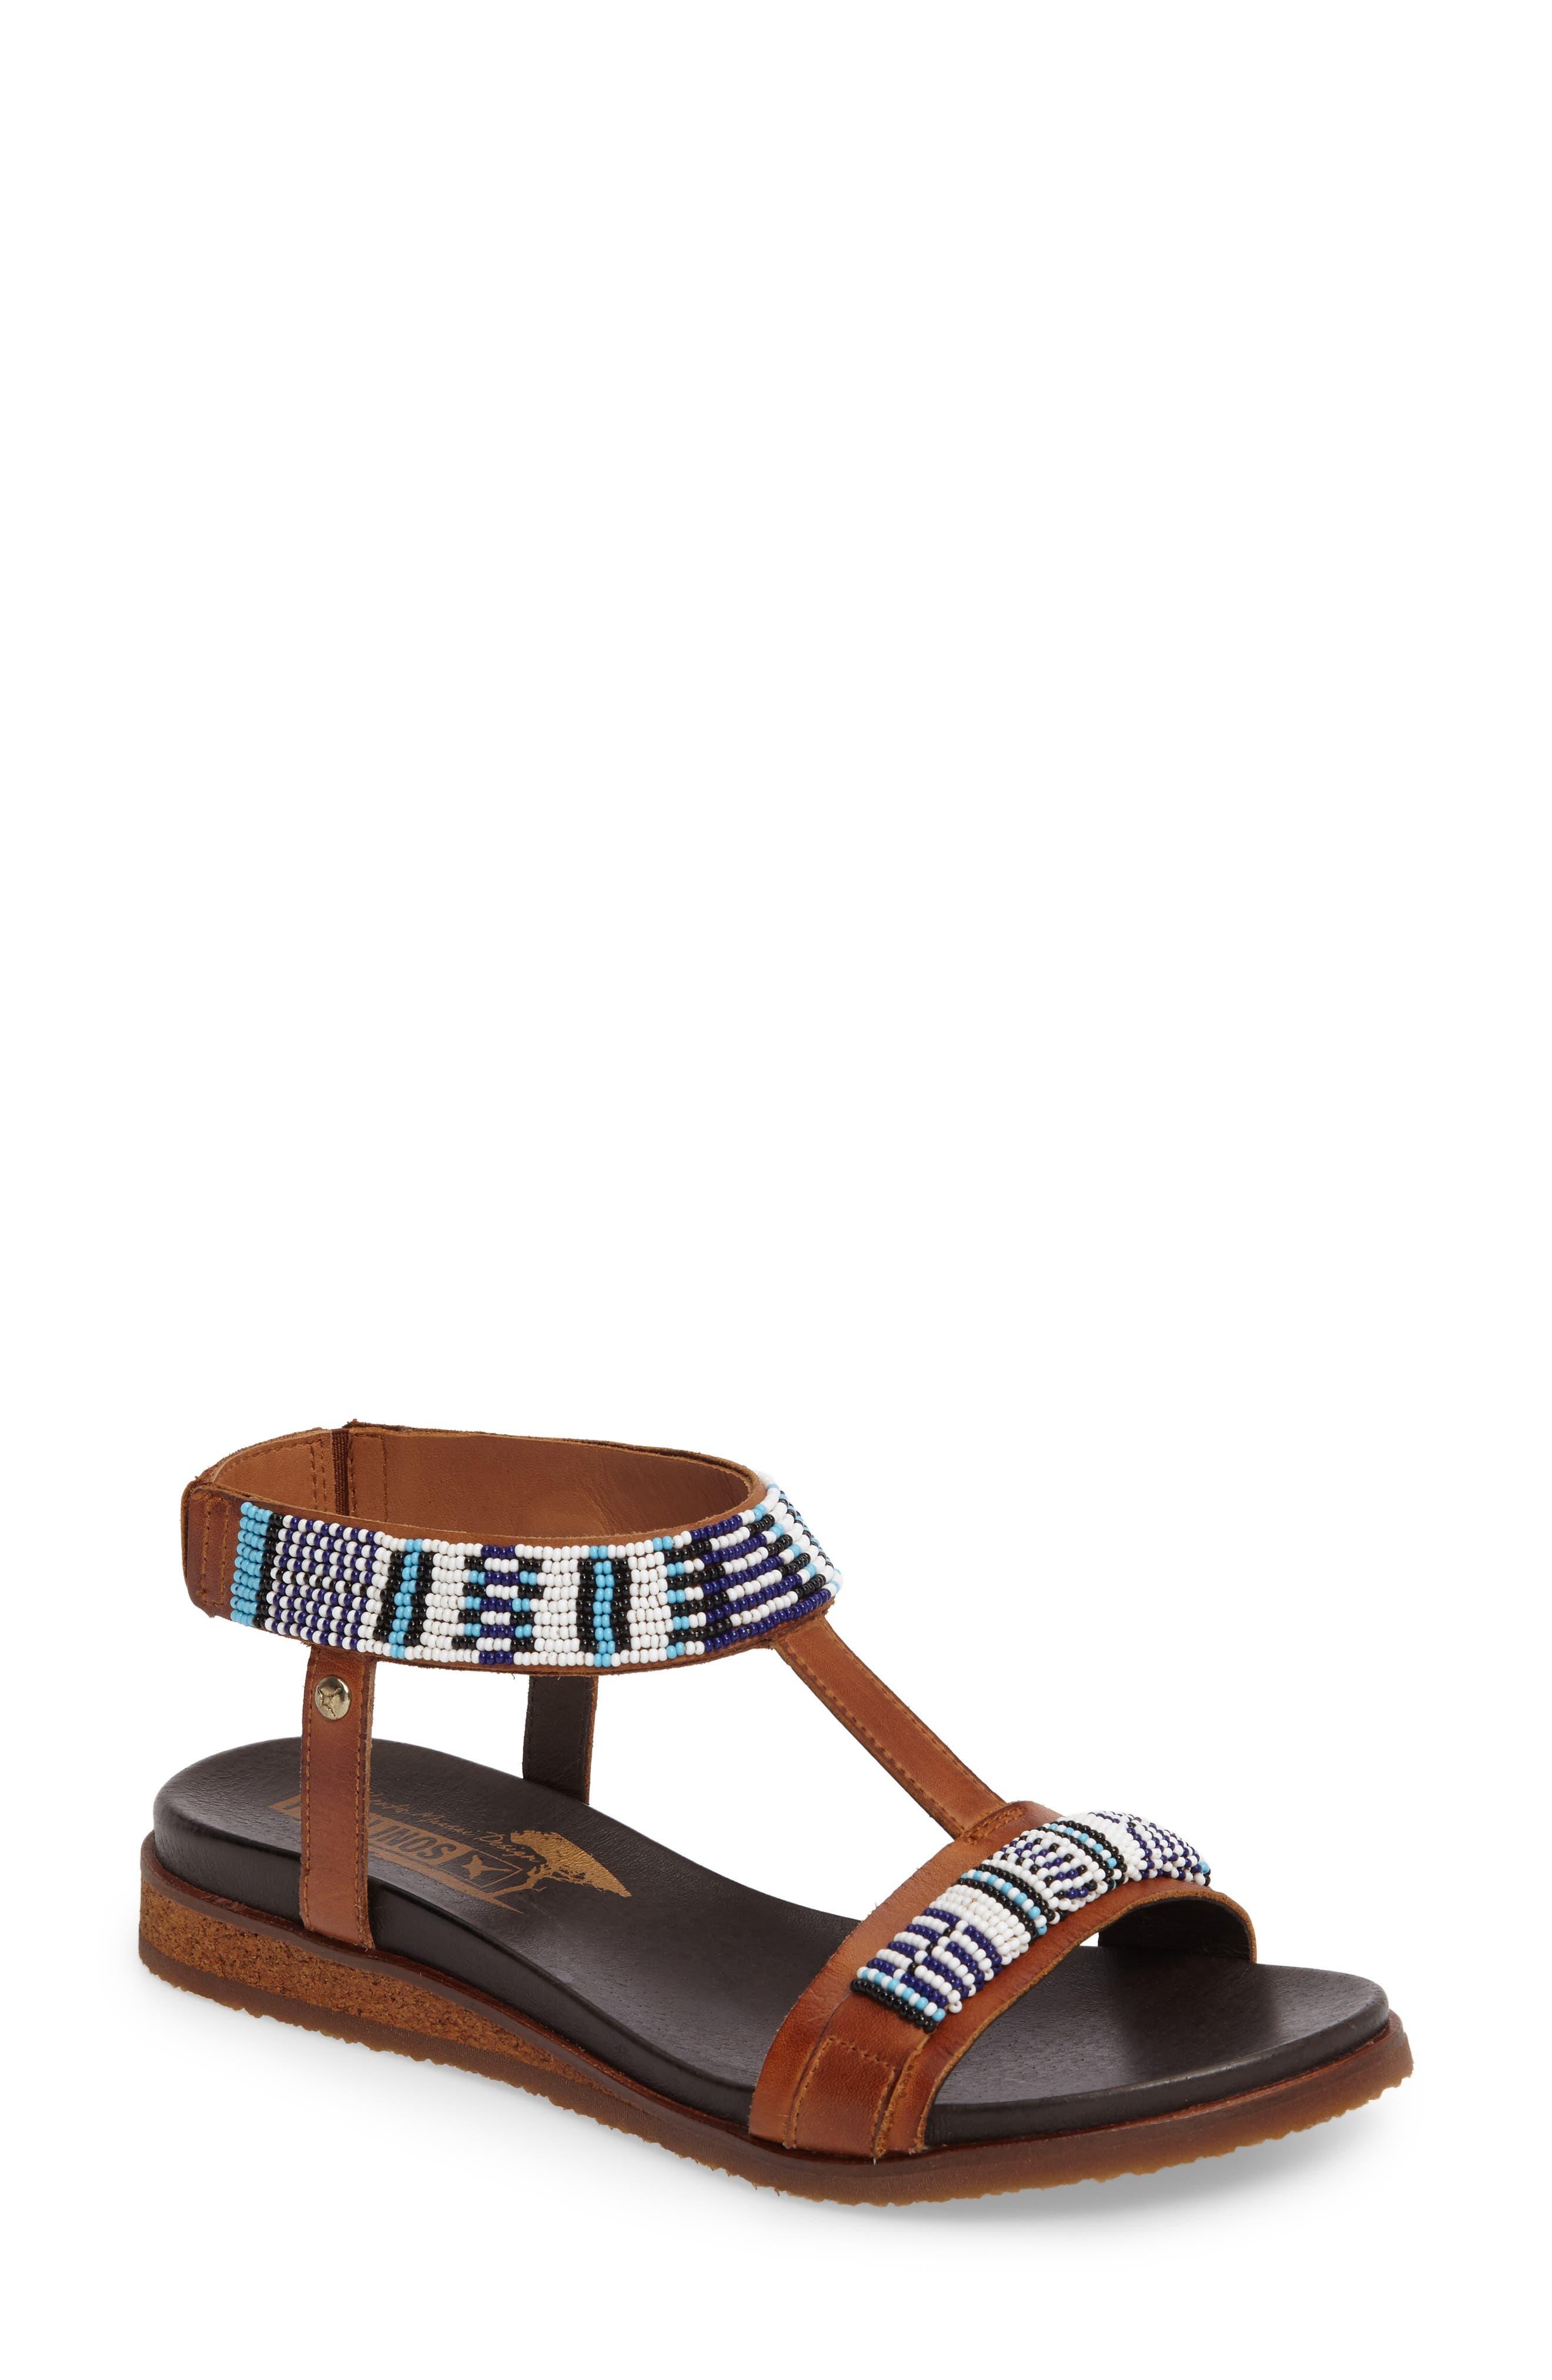 Antillas Beaded Sandal,                             Main thumbnail 1, color,                             Brandy Leather